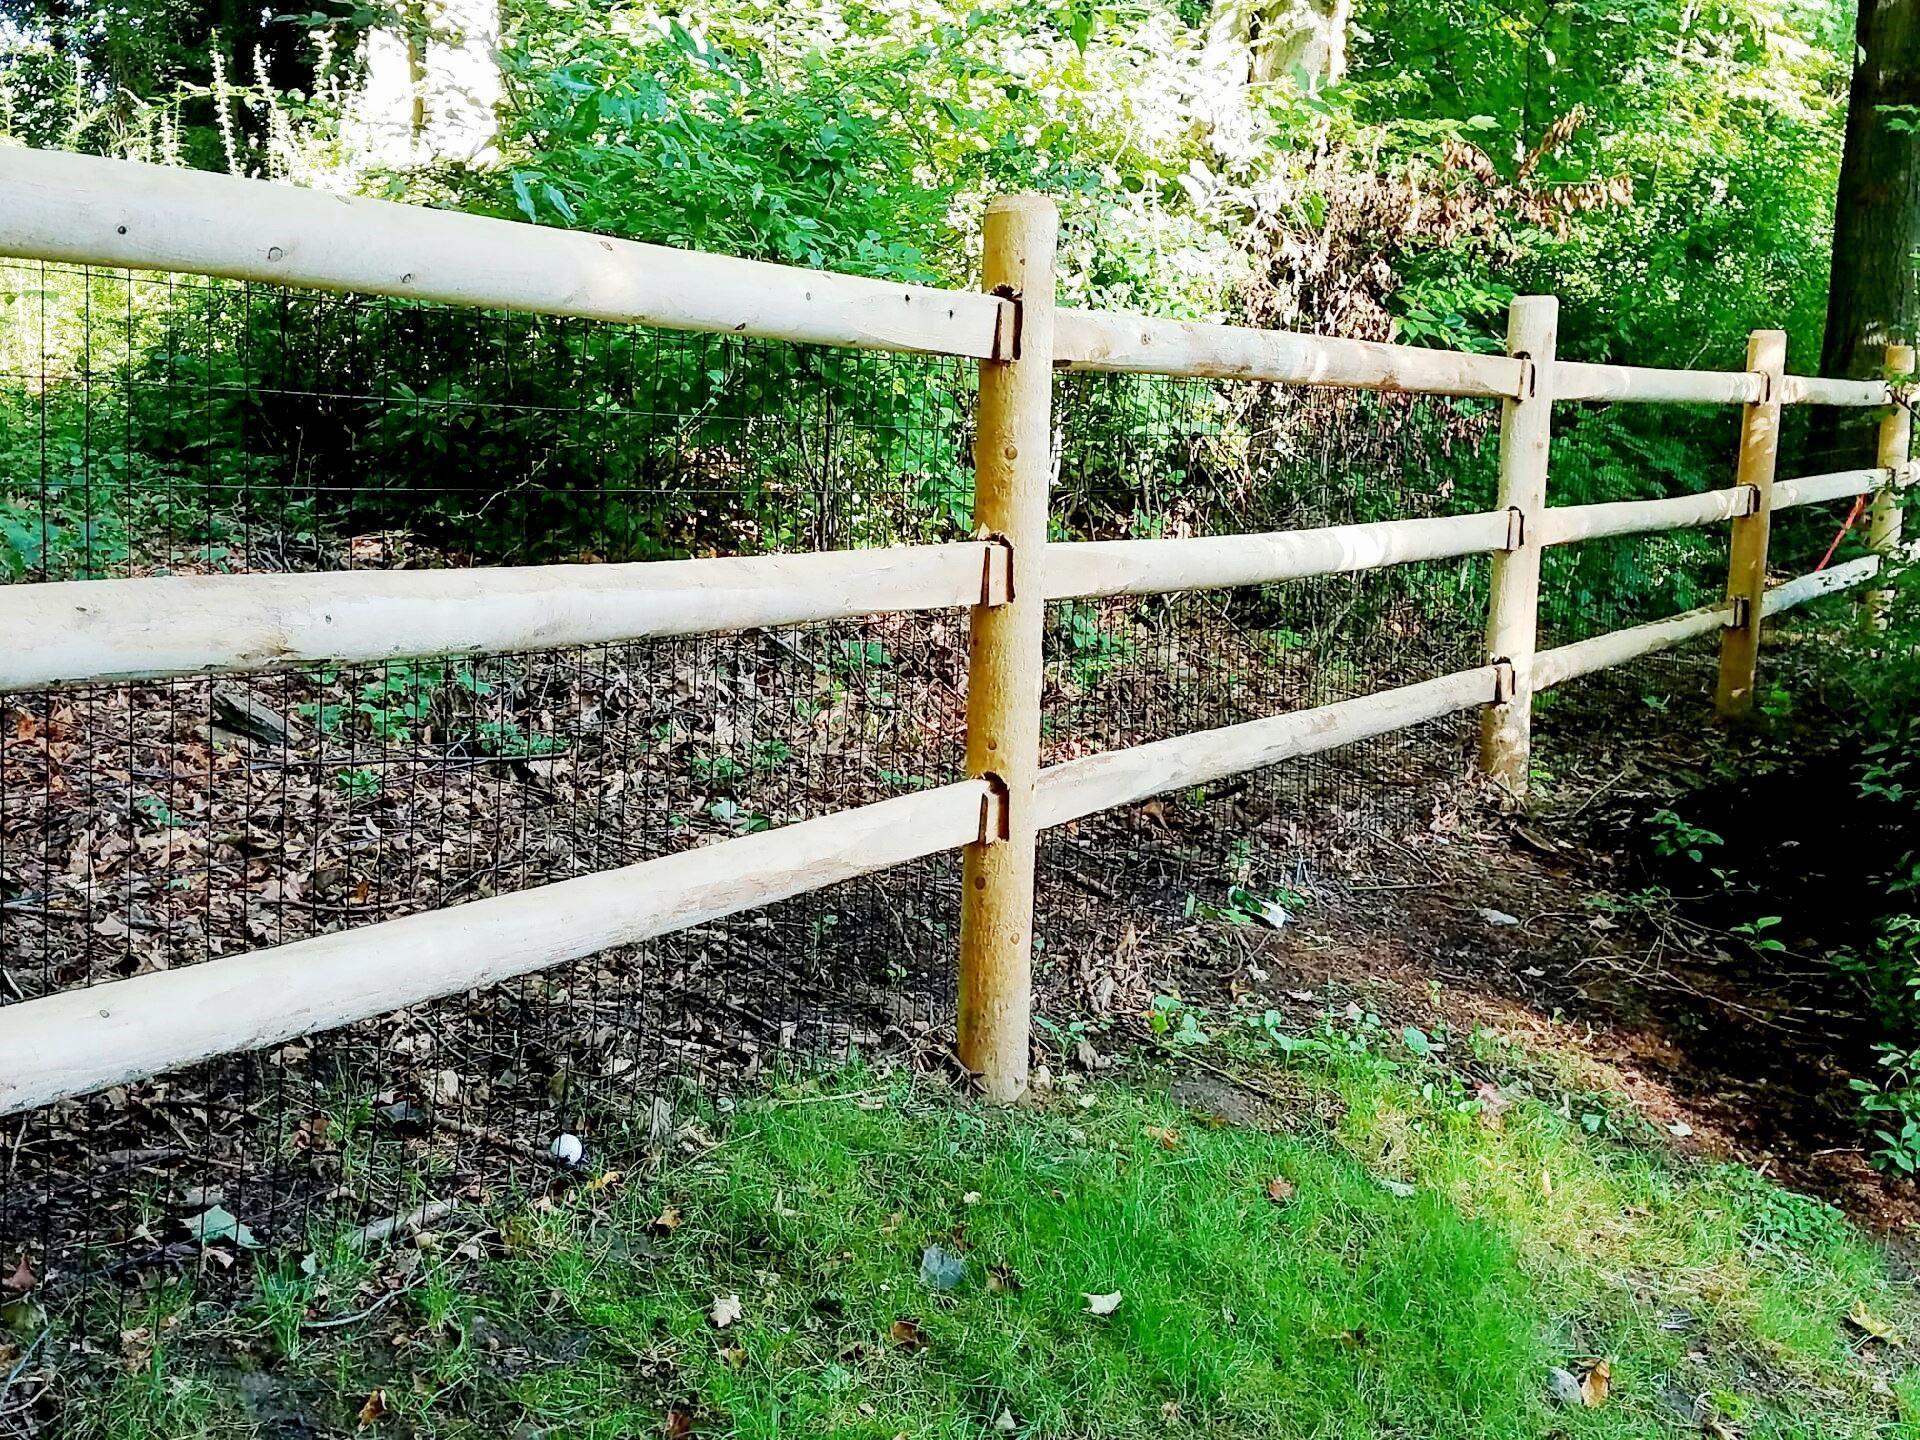 3 Rail Round Rail Post And Rail Fencing Wood Fence Design Fence Design Wood Fence